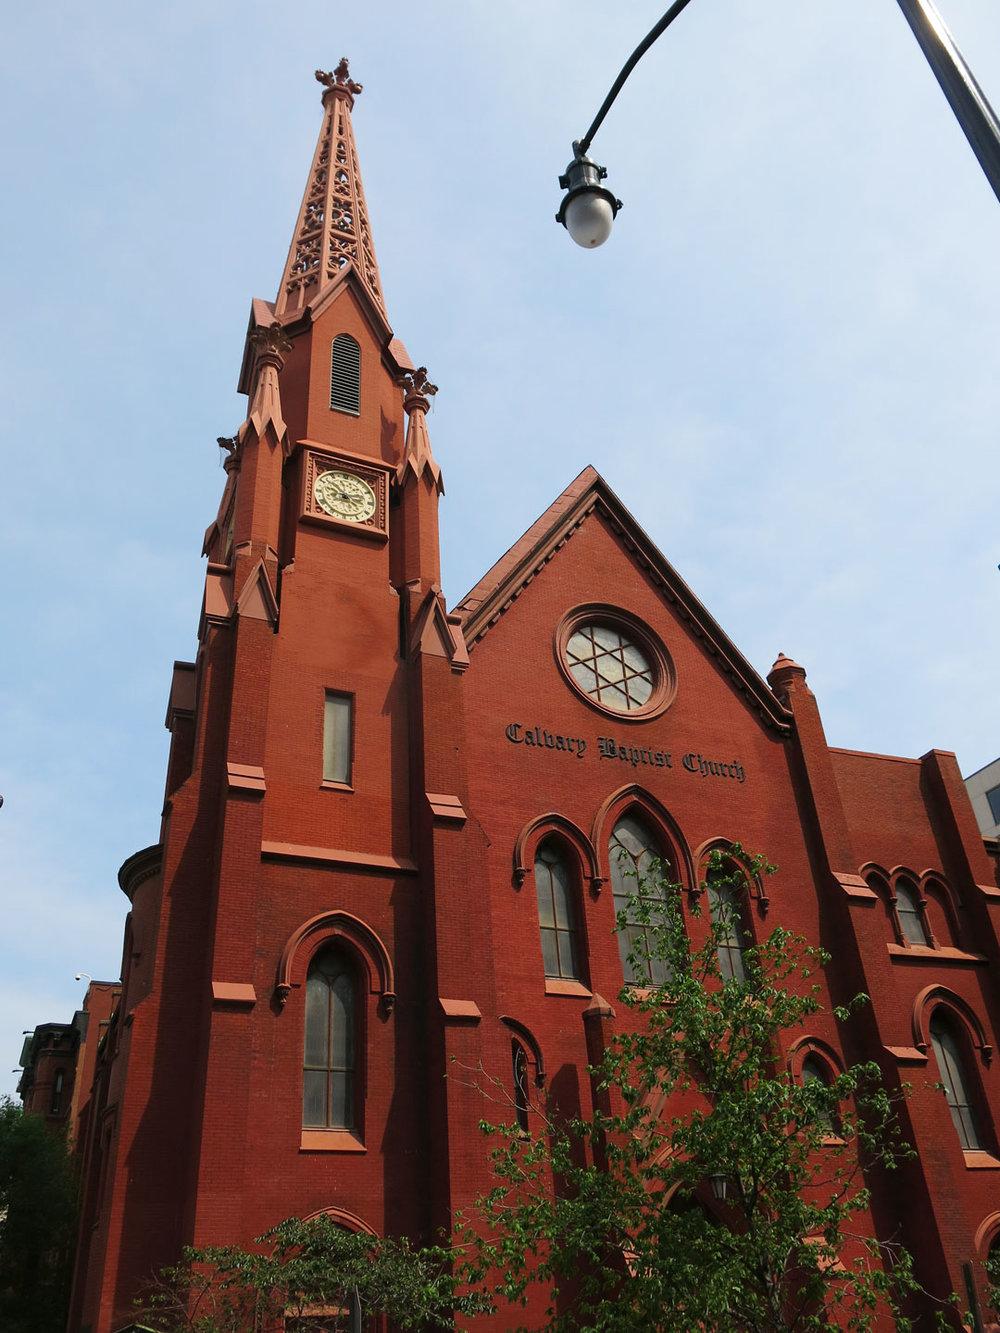 The very beautiful Calvary Baptist Church, in Chinatown, Washington D.C.